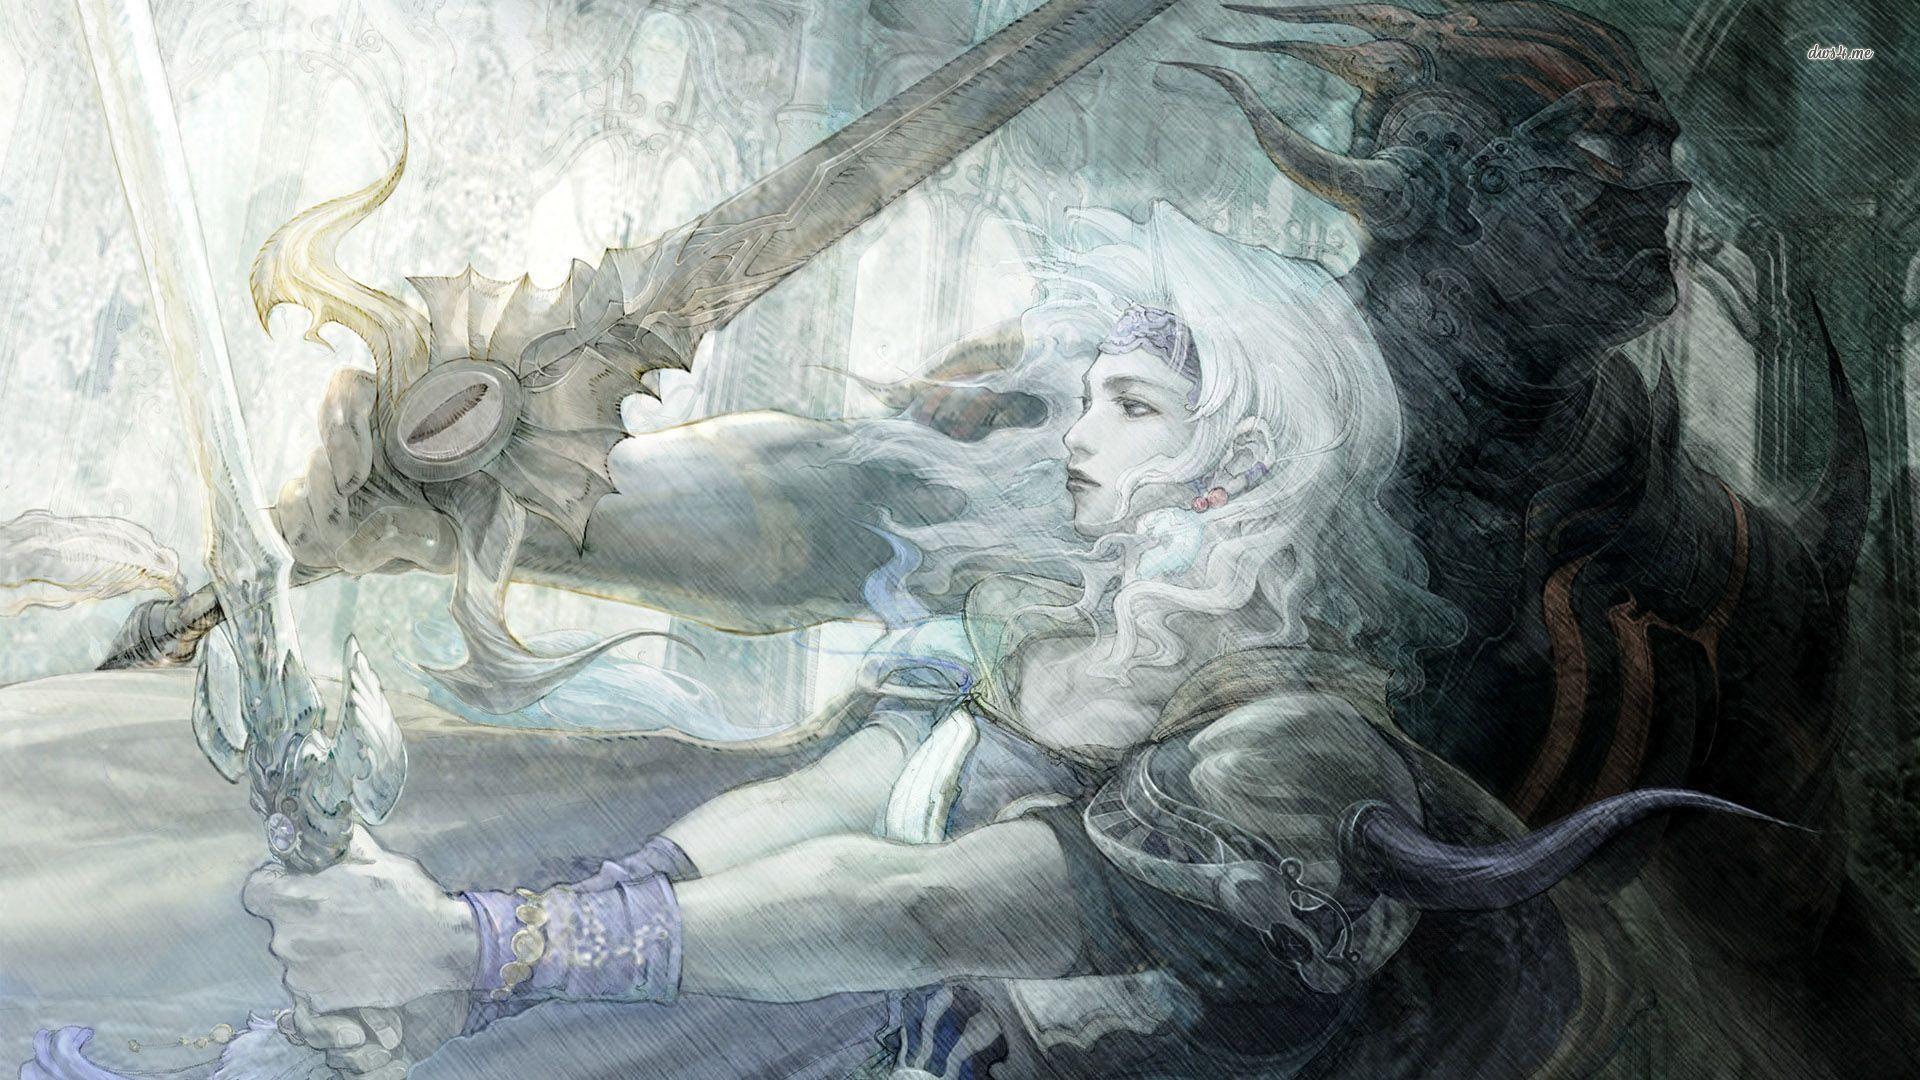 Final Fantasy IV wallpaper – Game wallpapers – #